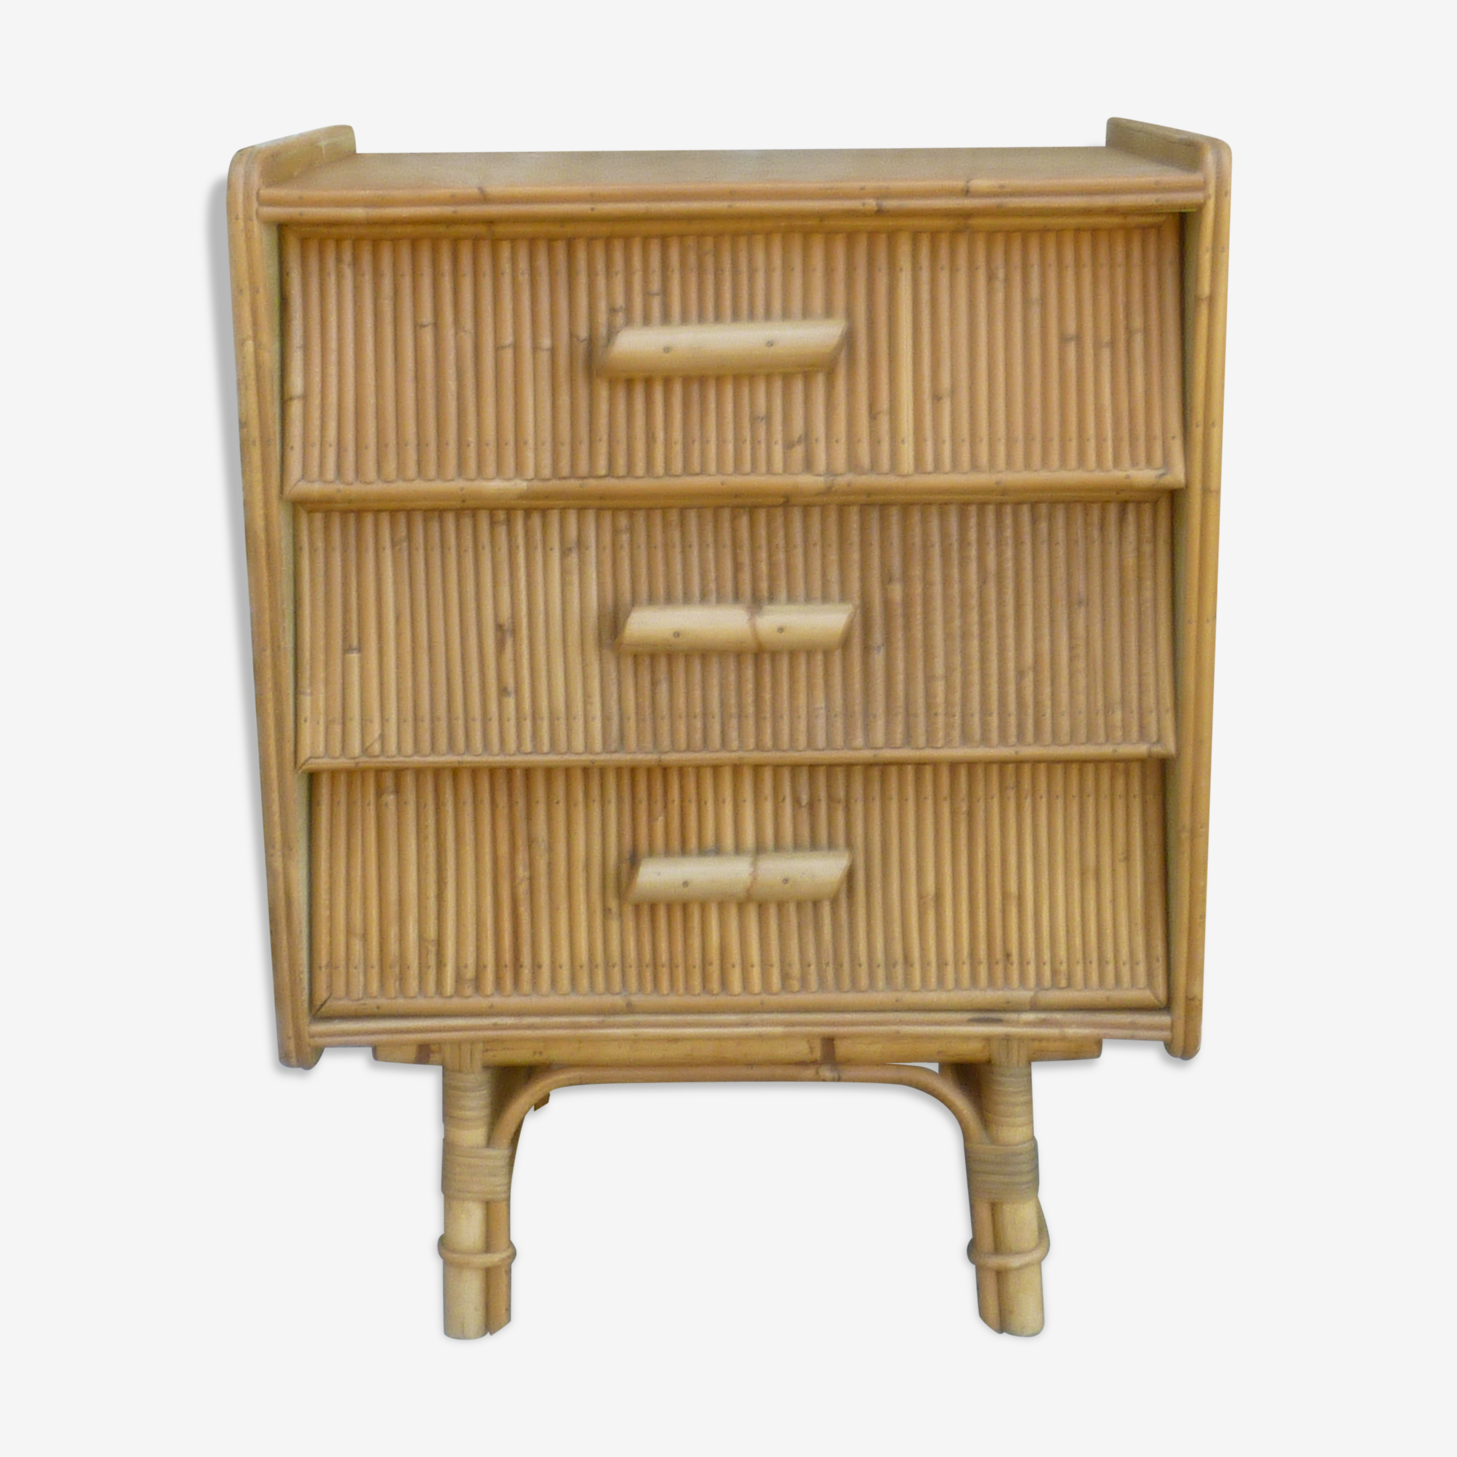 Dresser 60-70 years